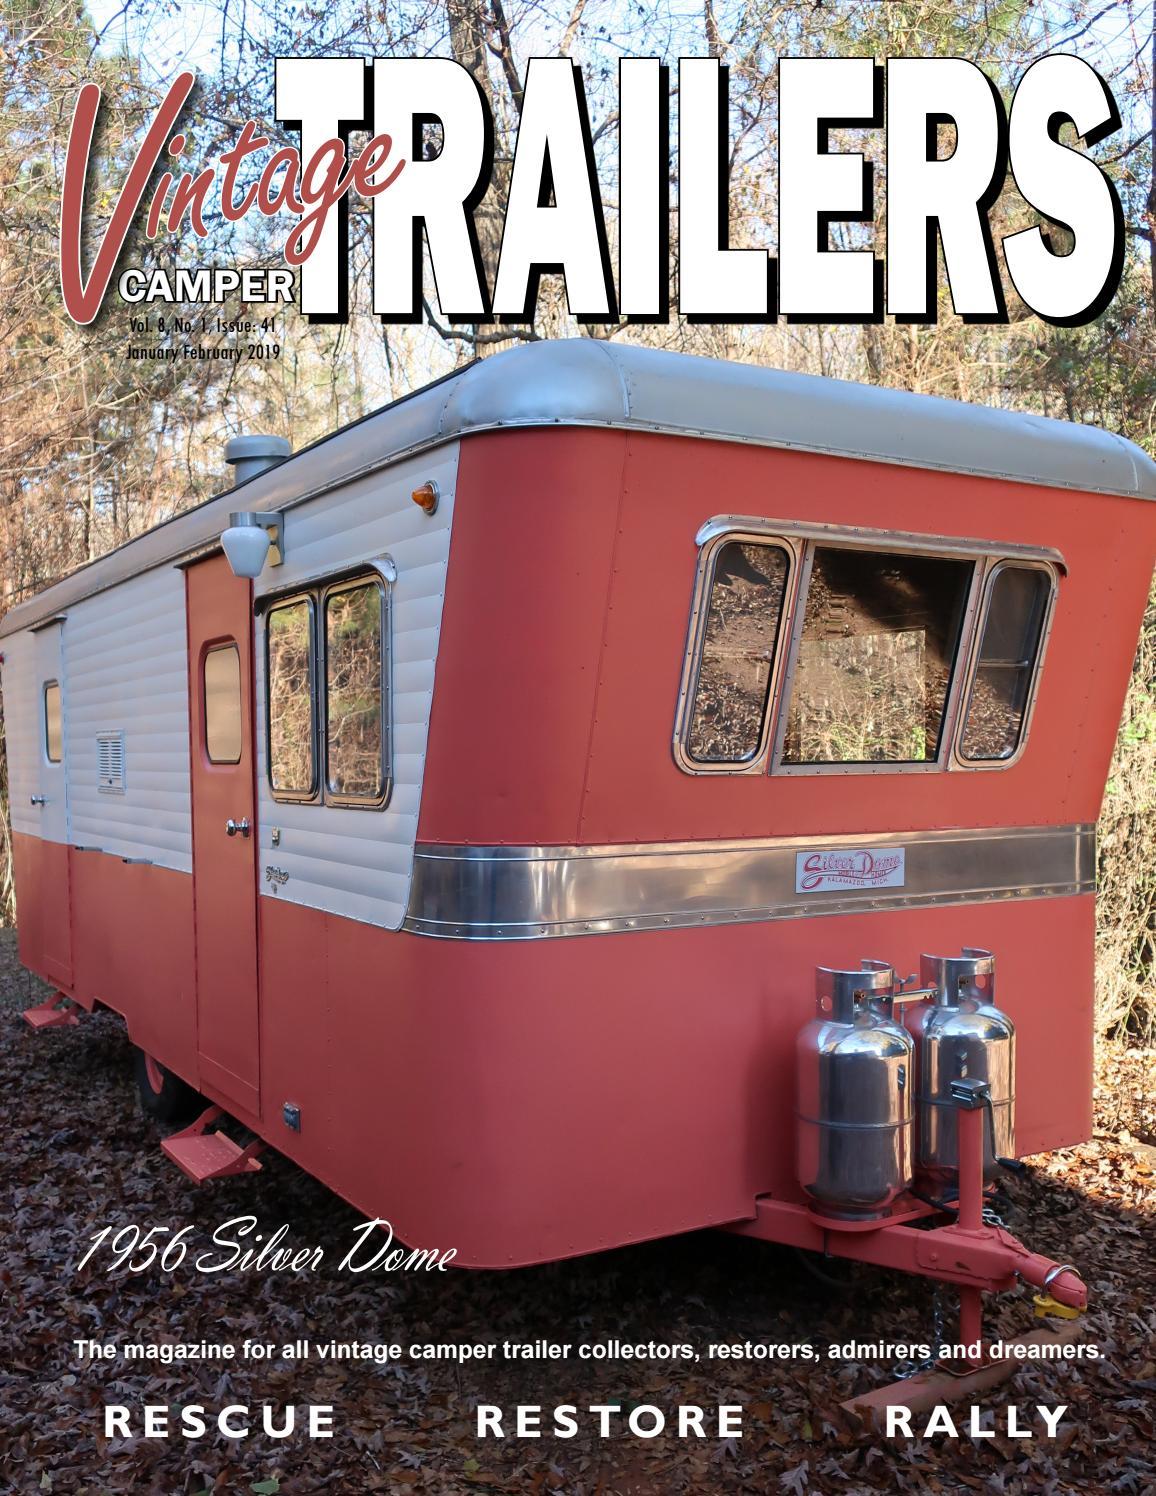 The Vintage Camper Trailers Magazine #41 by Vintage Camper Trailers